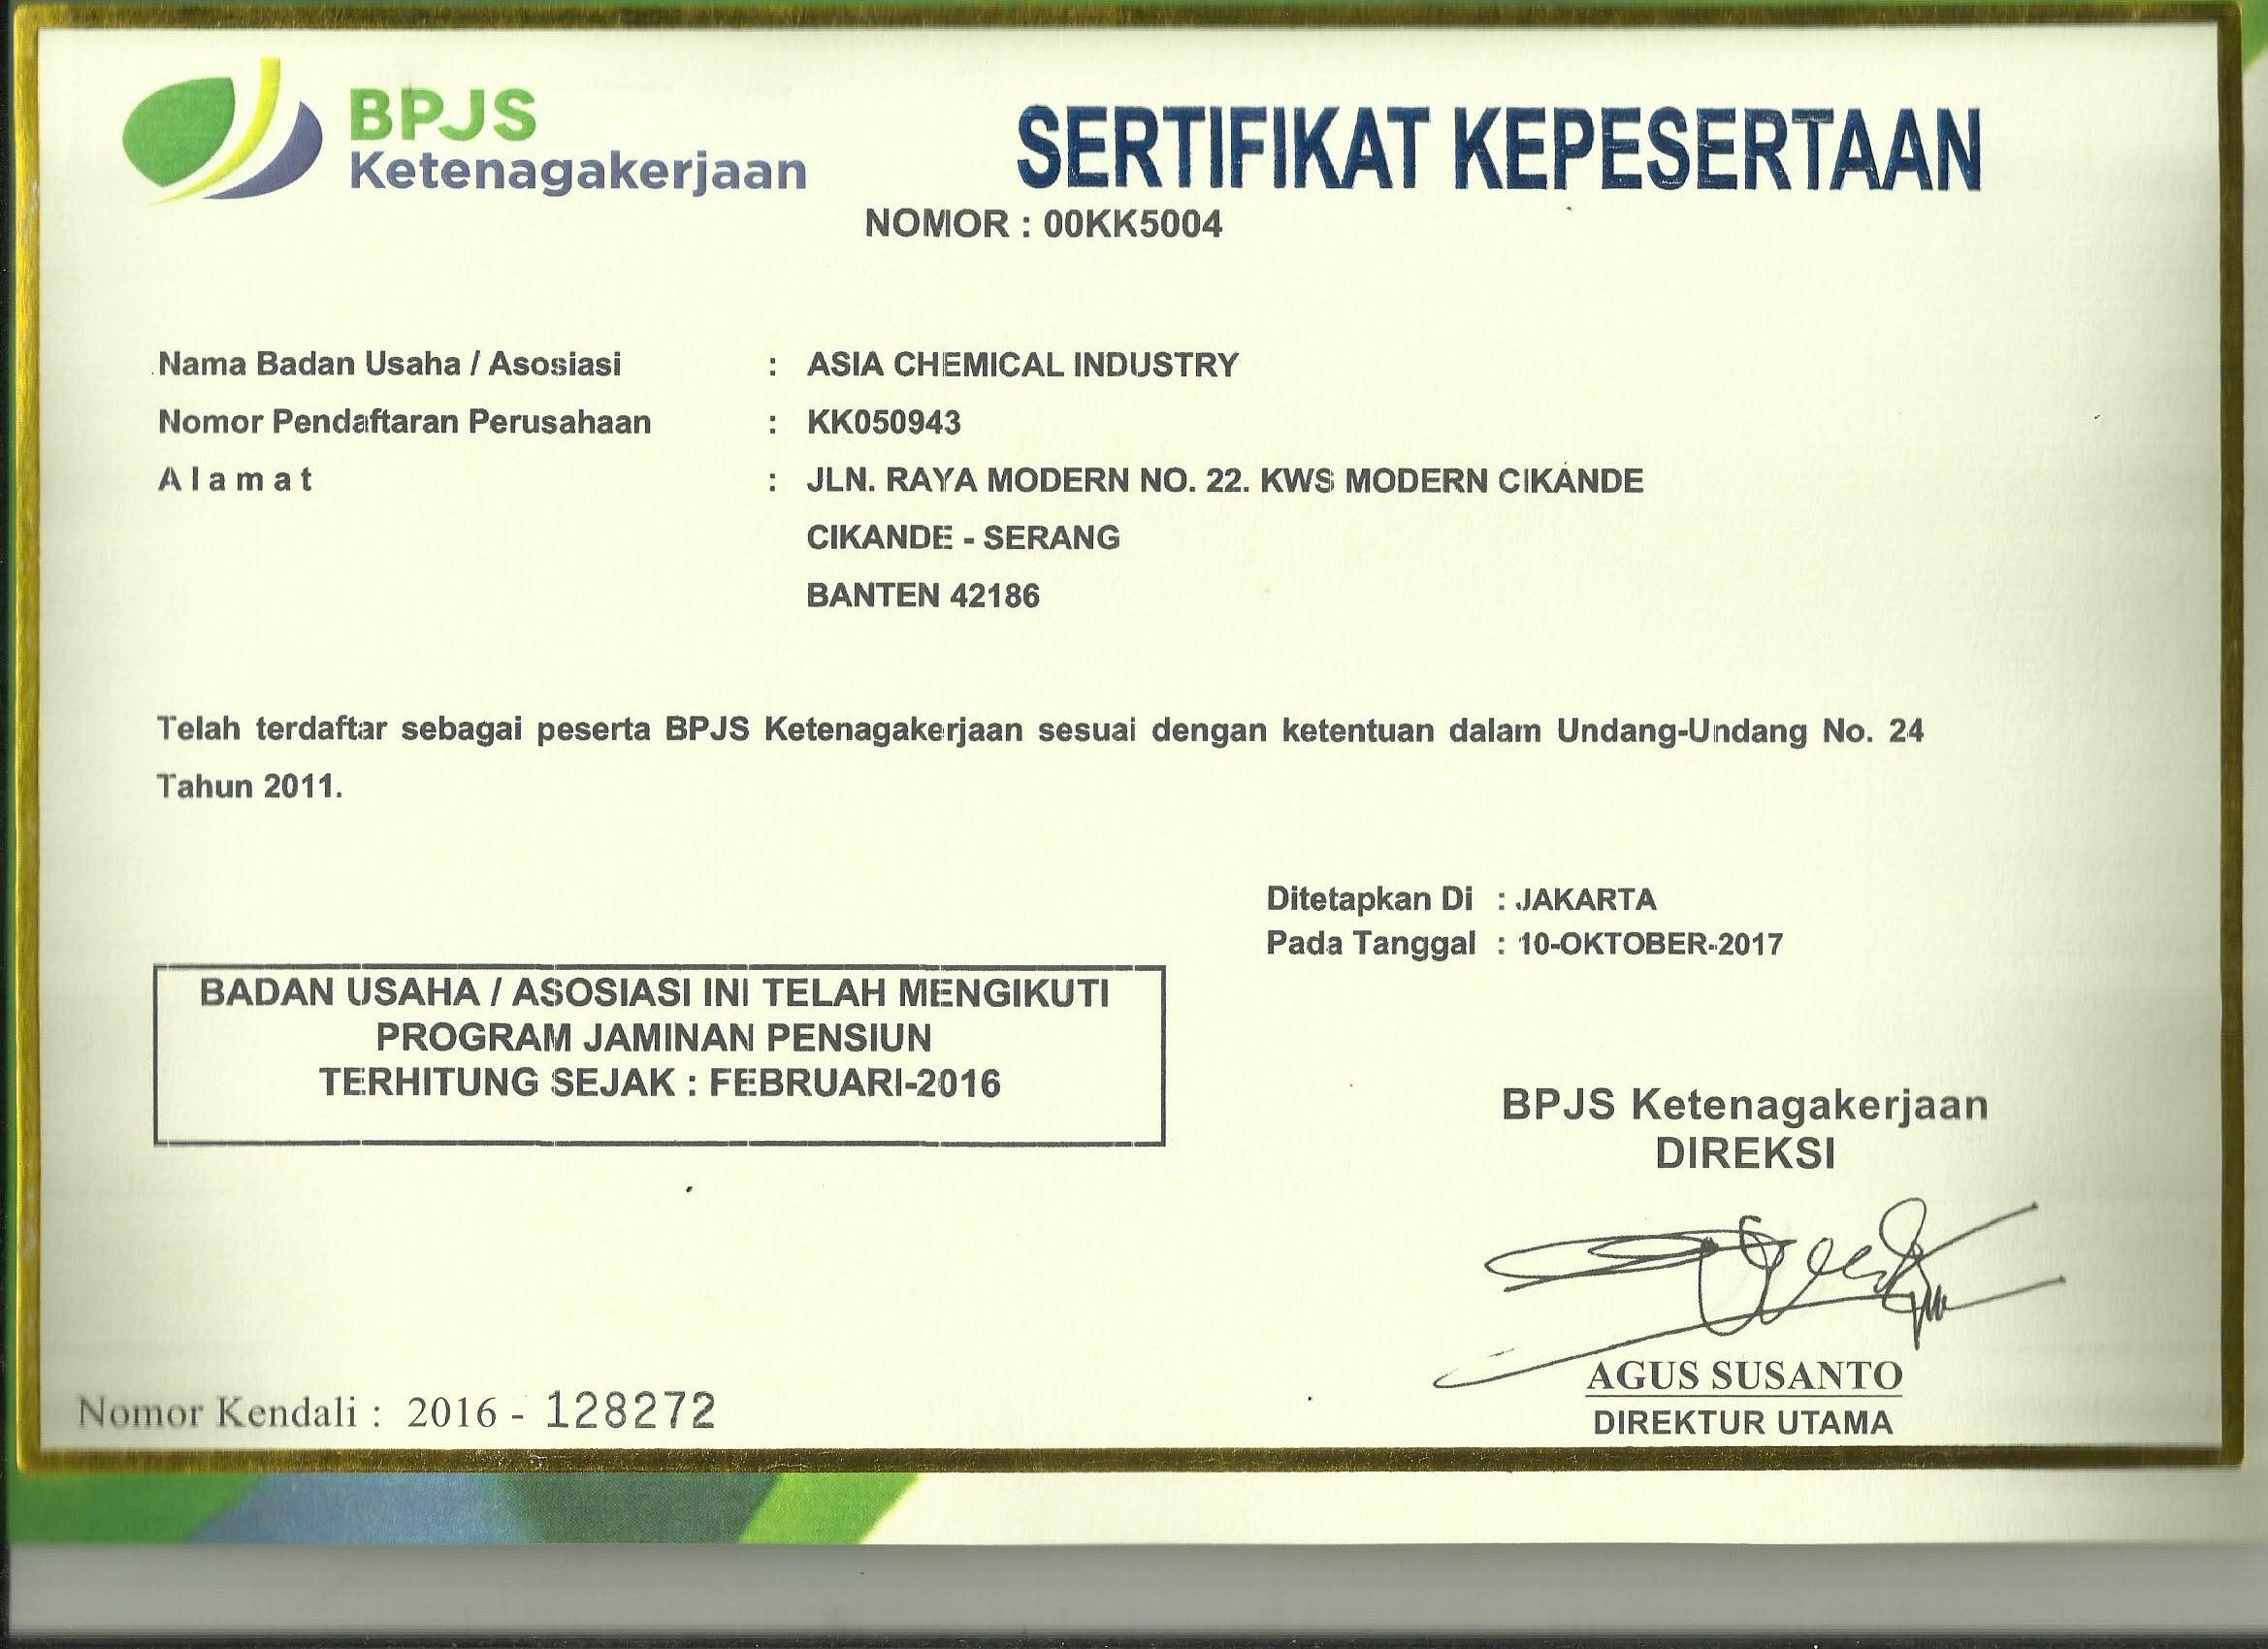 BPJS certificate ACI